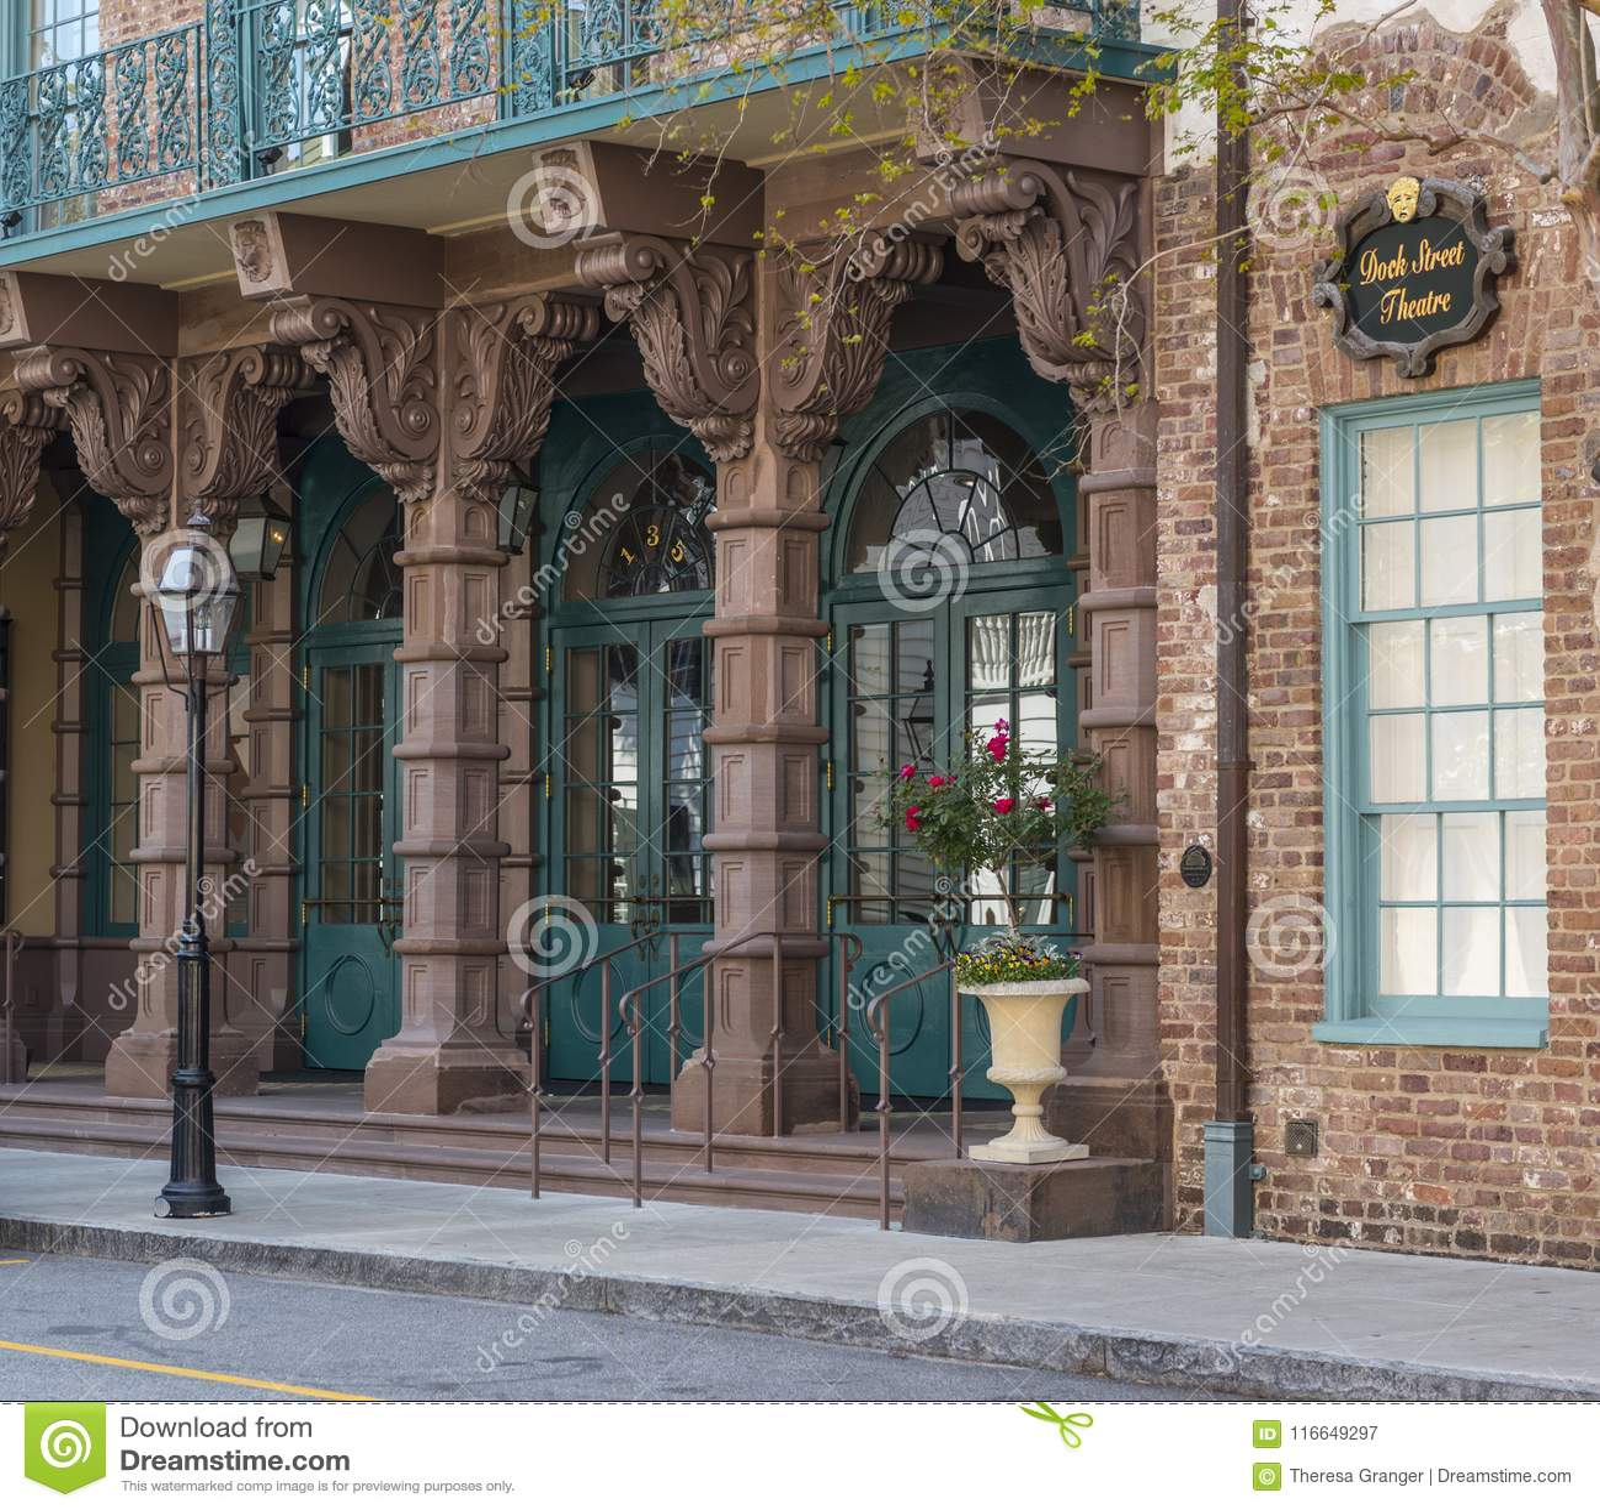 CHARLESTON, South Carolina MARCH 23 2018: Dock Street Theatre, Charleston, South Carolina